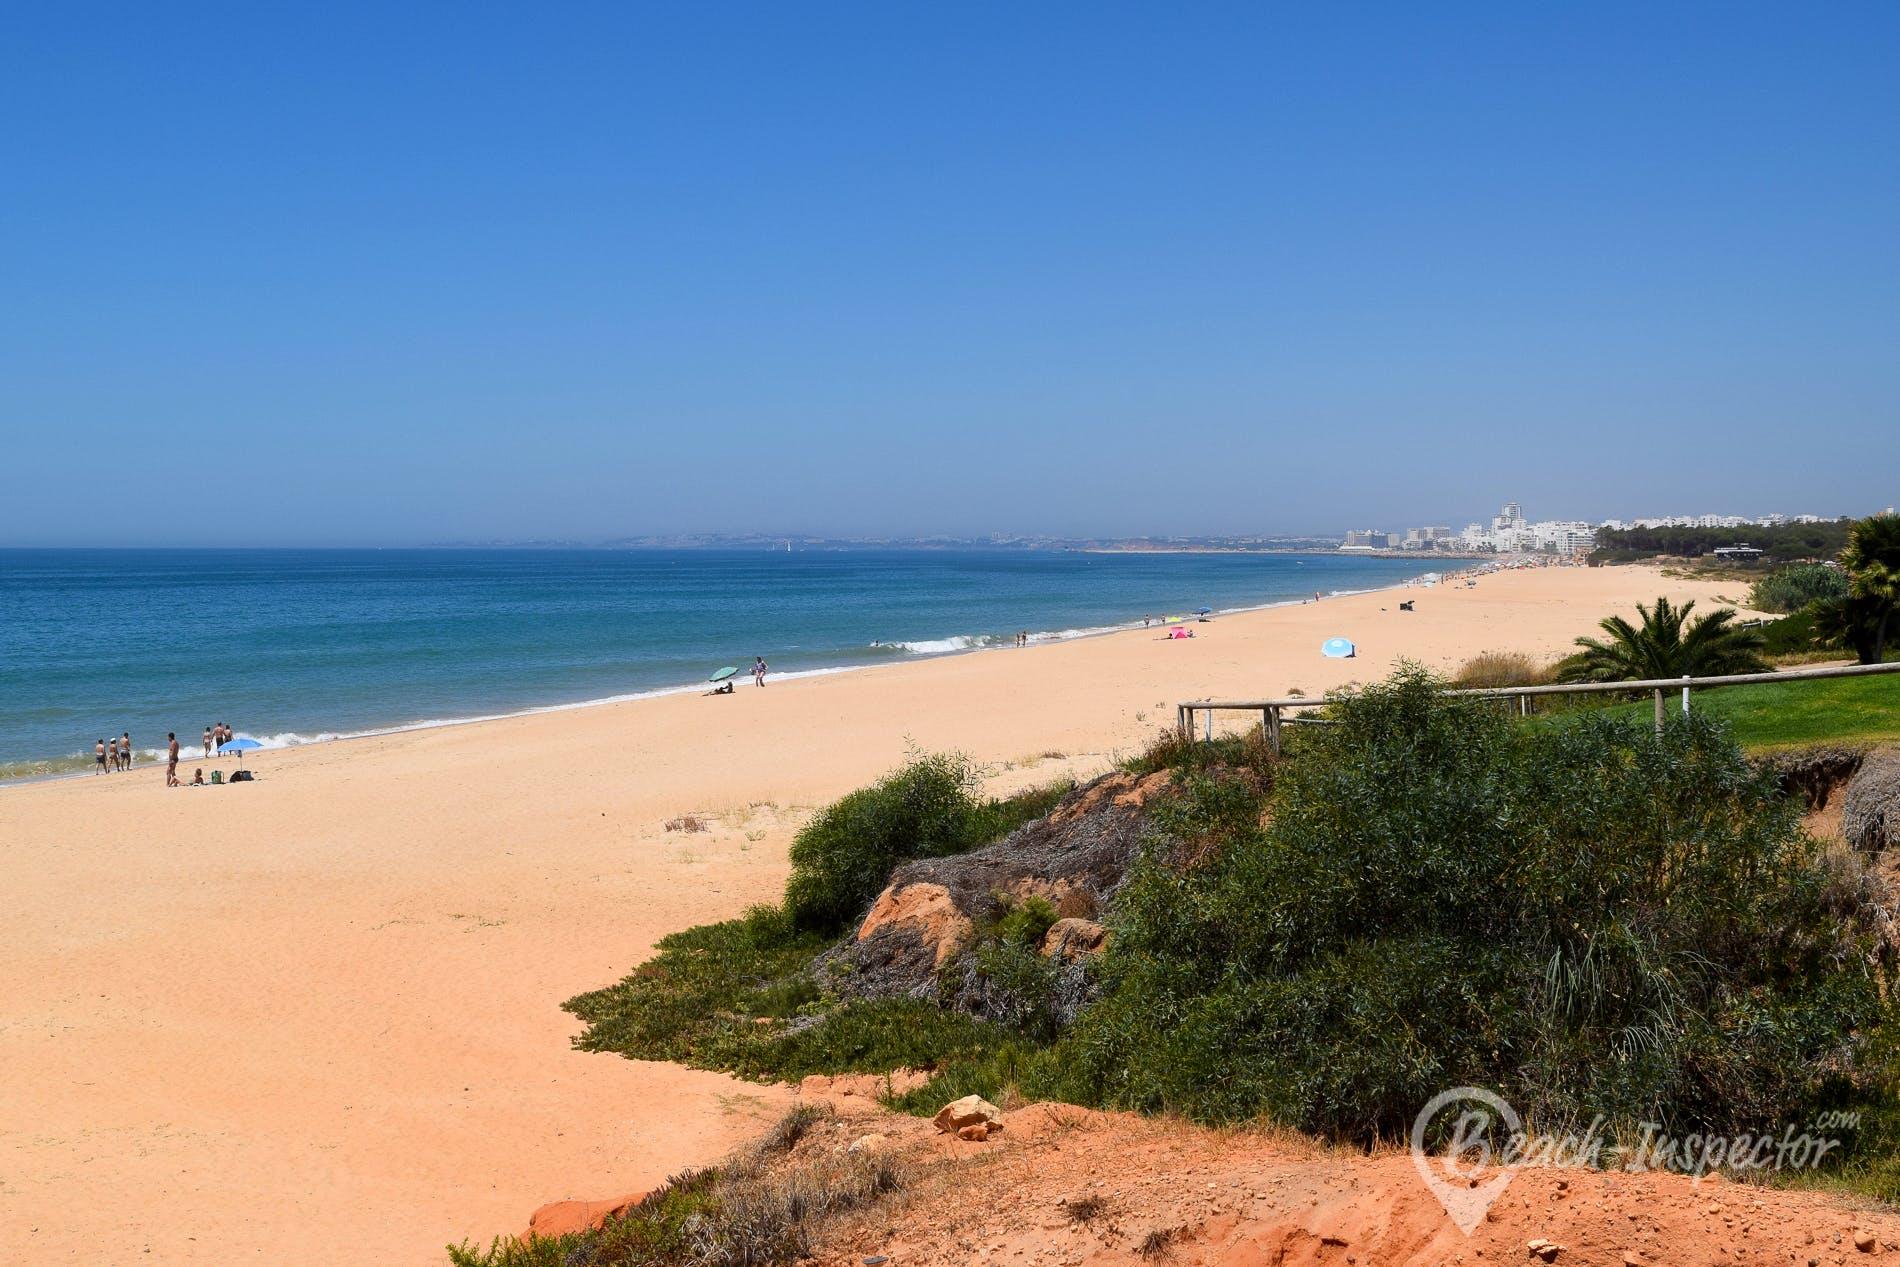 Playa Praia do Trafal, Algarve, Portugal